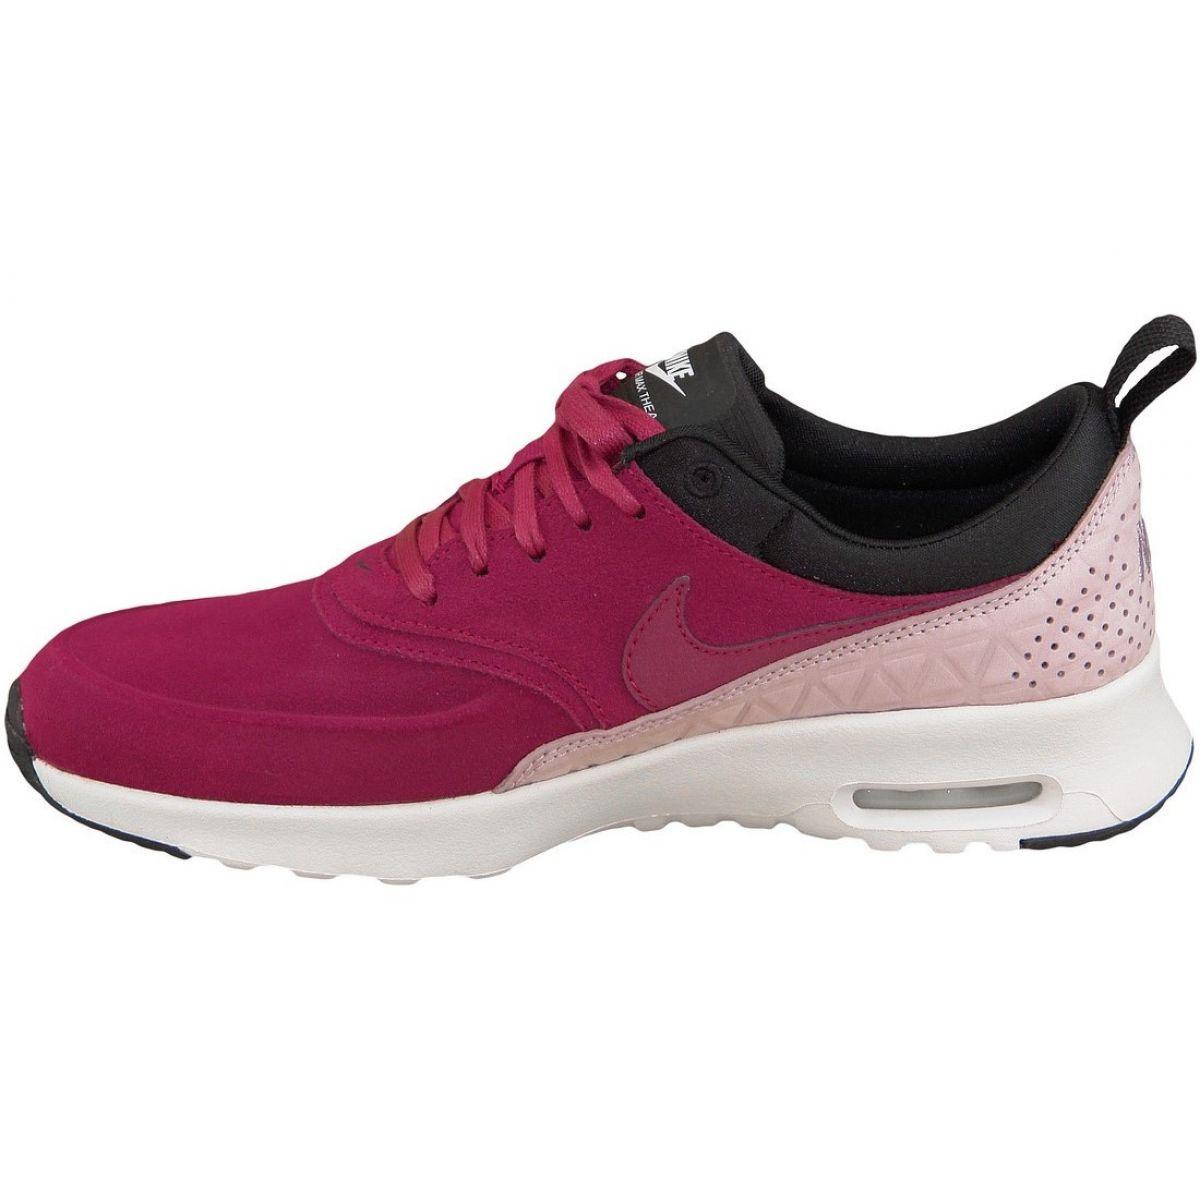 Skor Nike Air Max Thea Premium W 599408 008 svart